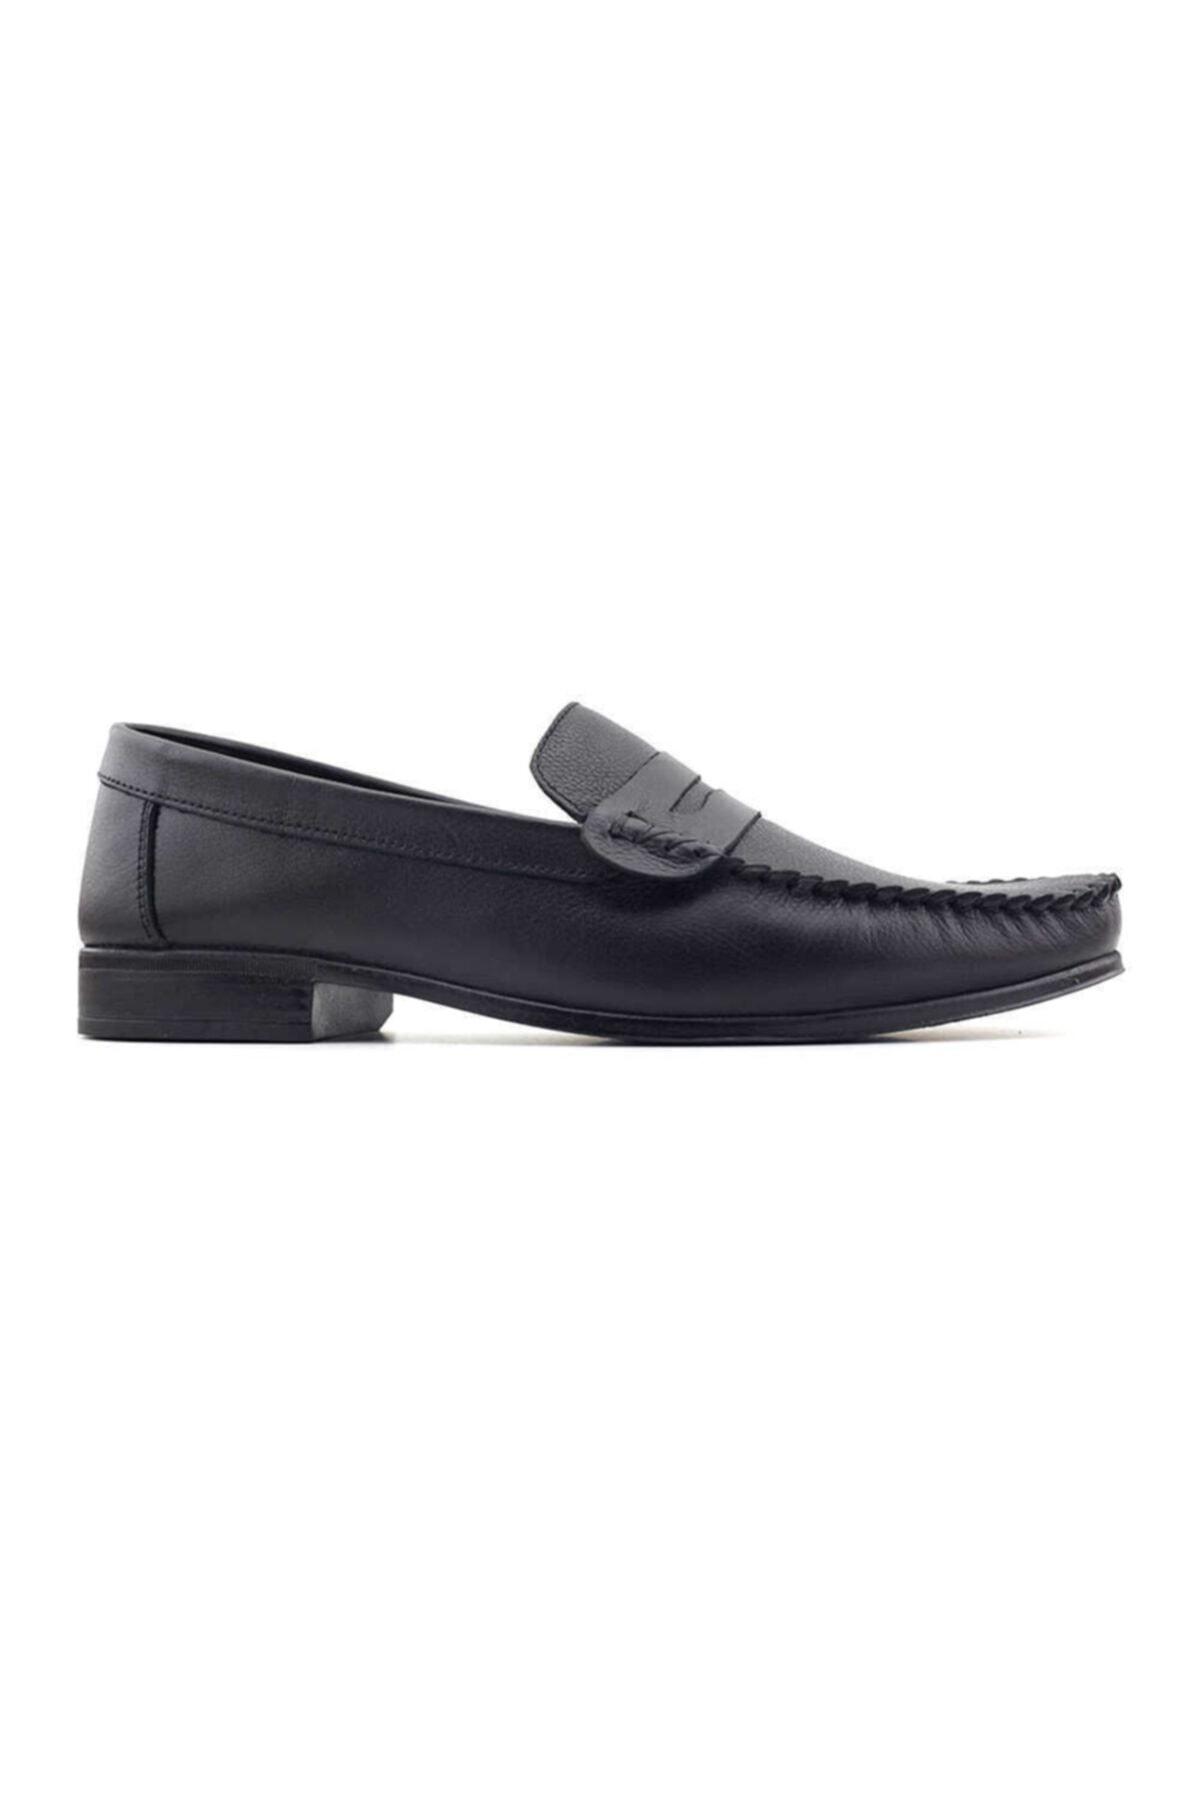 Kayra Catchers 2020 Hakiki Deri Erkek Ayakkabı-siyah 1